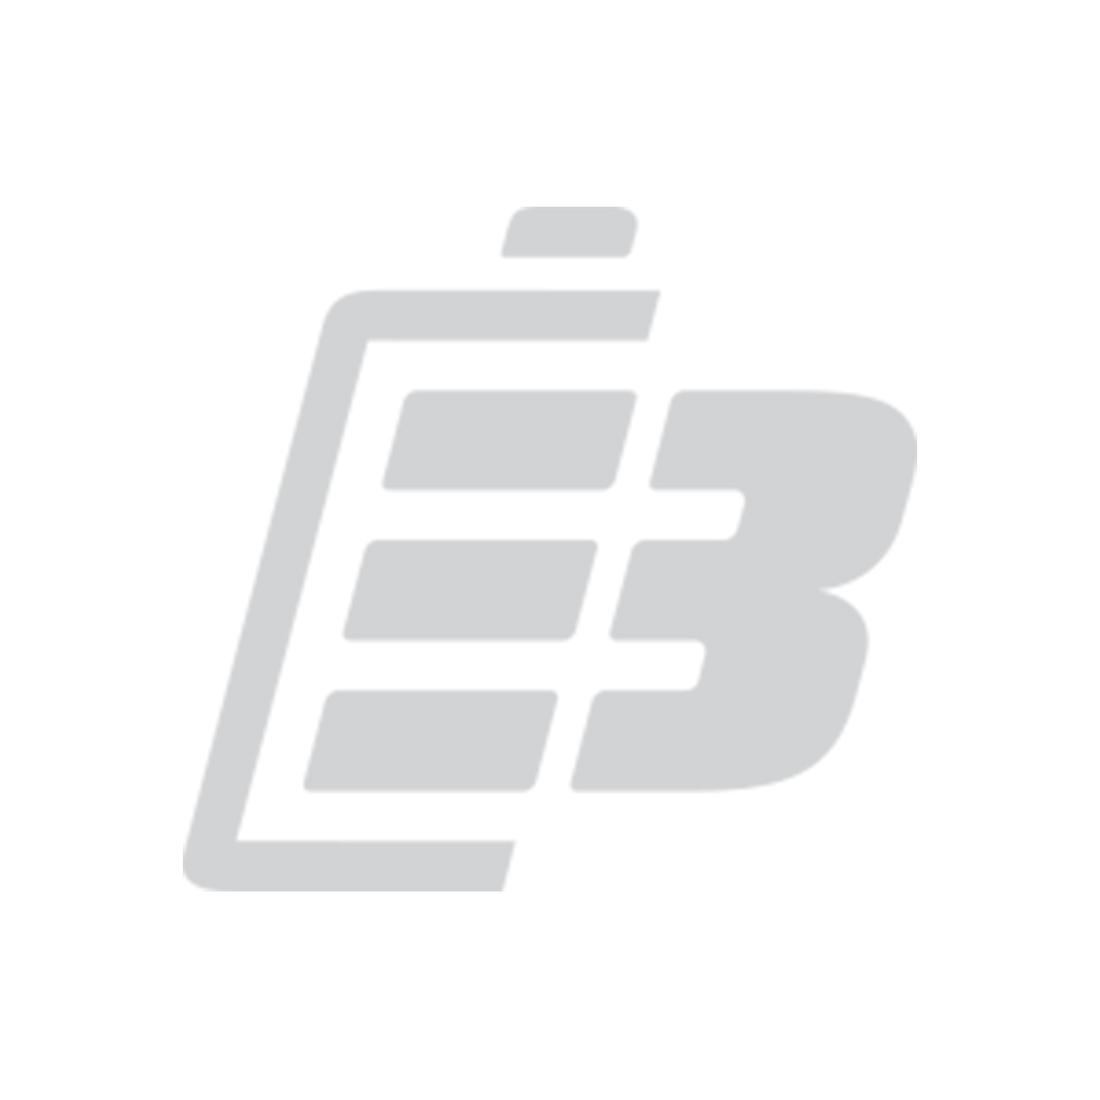 CSB Lead Acid Battery HRL12330W 1